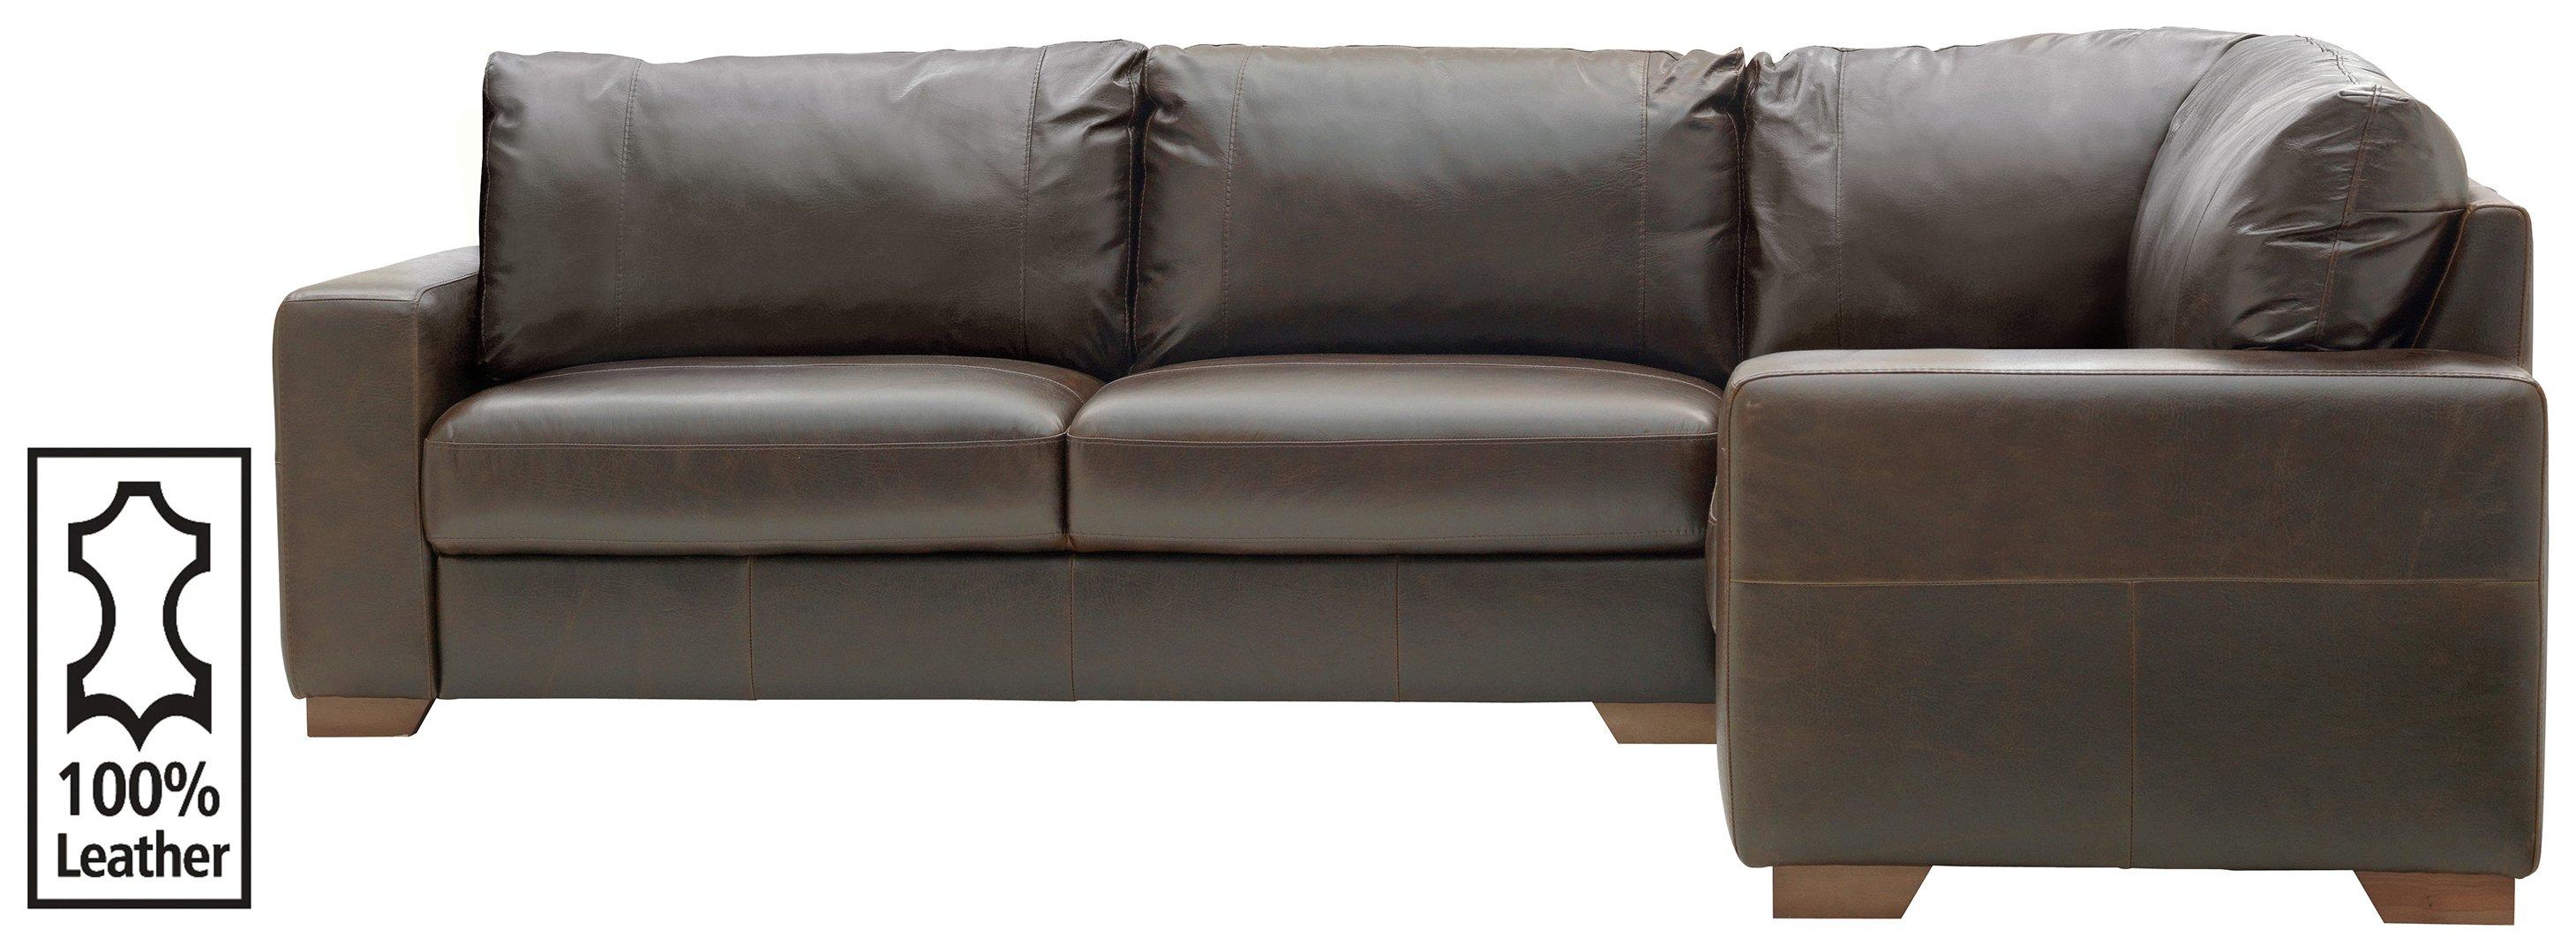 Argos Home Eton Right Corner Leather Sofa - Dark Brown